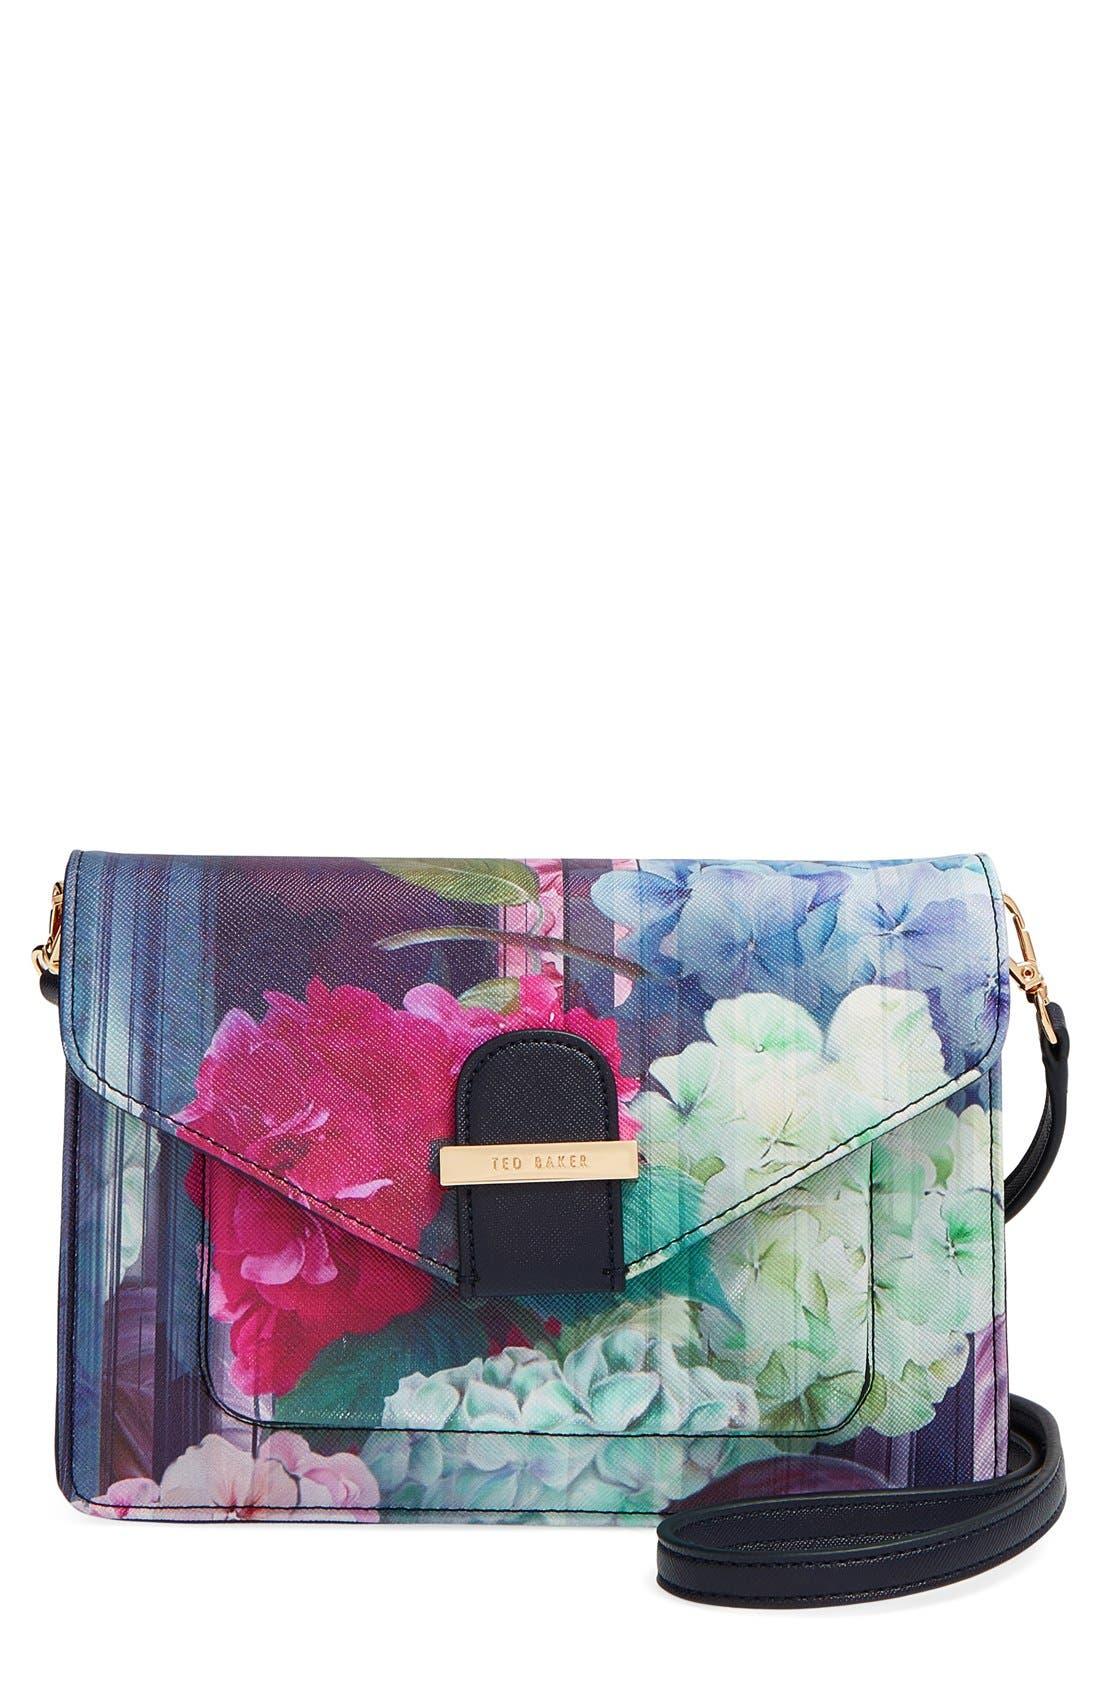 Main Image - Ted Baker London 'Hydrangea' Floral Print Crossbody Bag